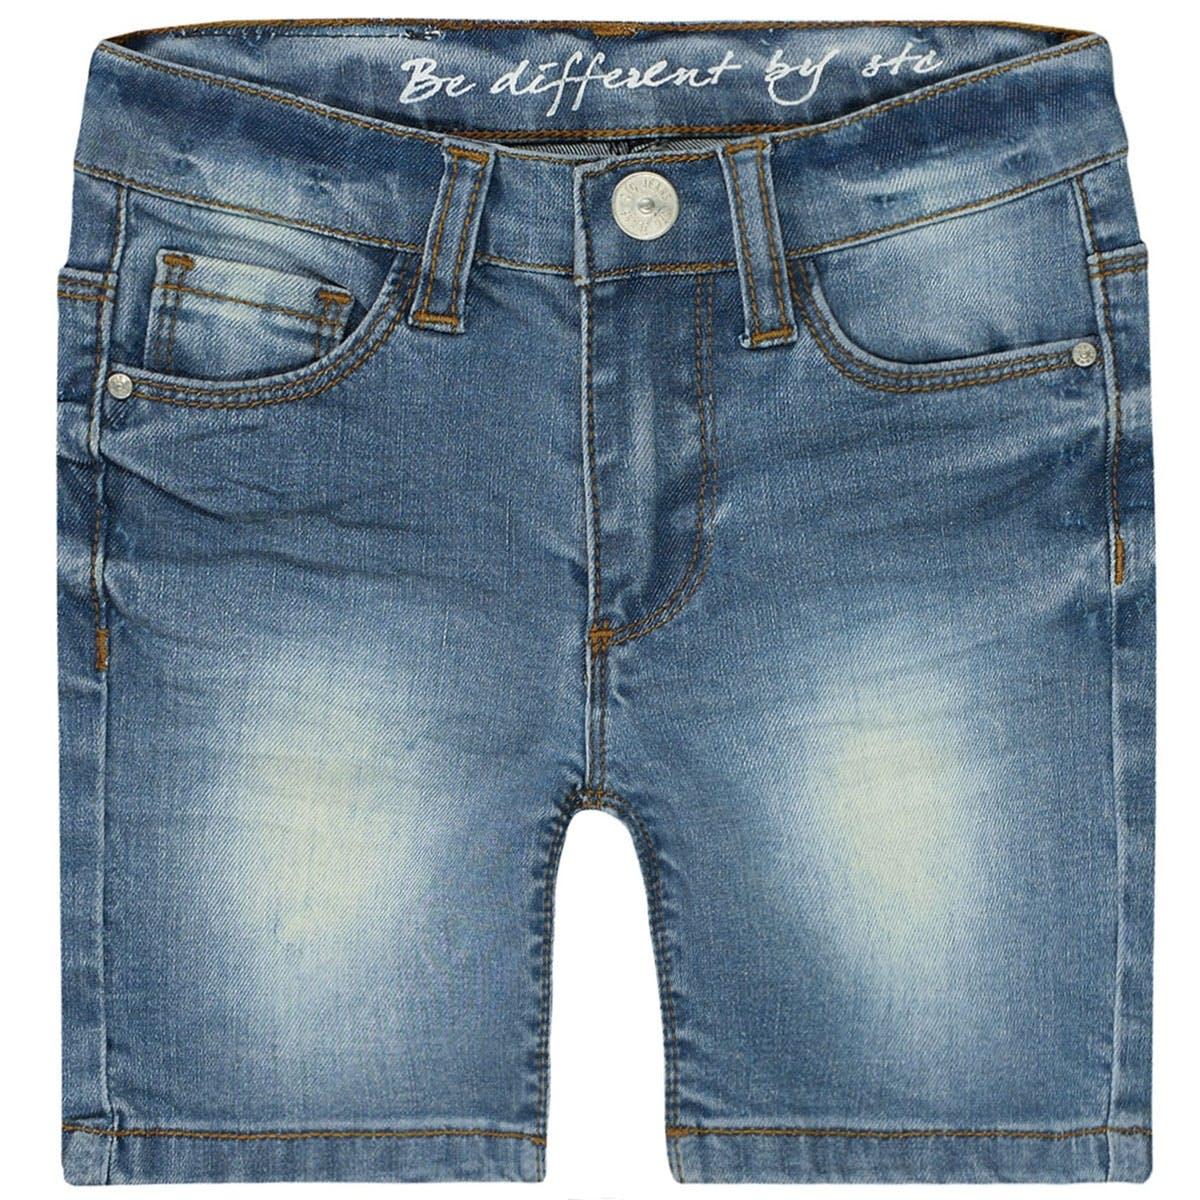 Mädchen Jeans Shorts Slim Fit - Light Blue Denim